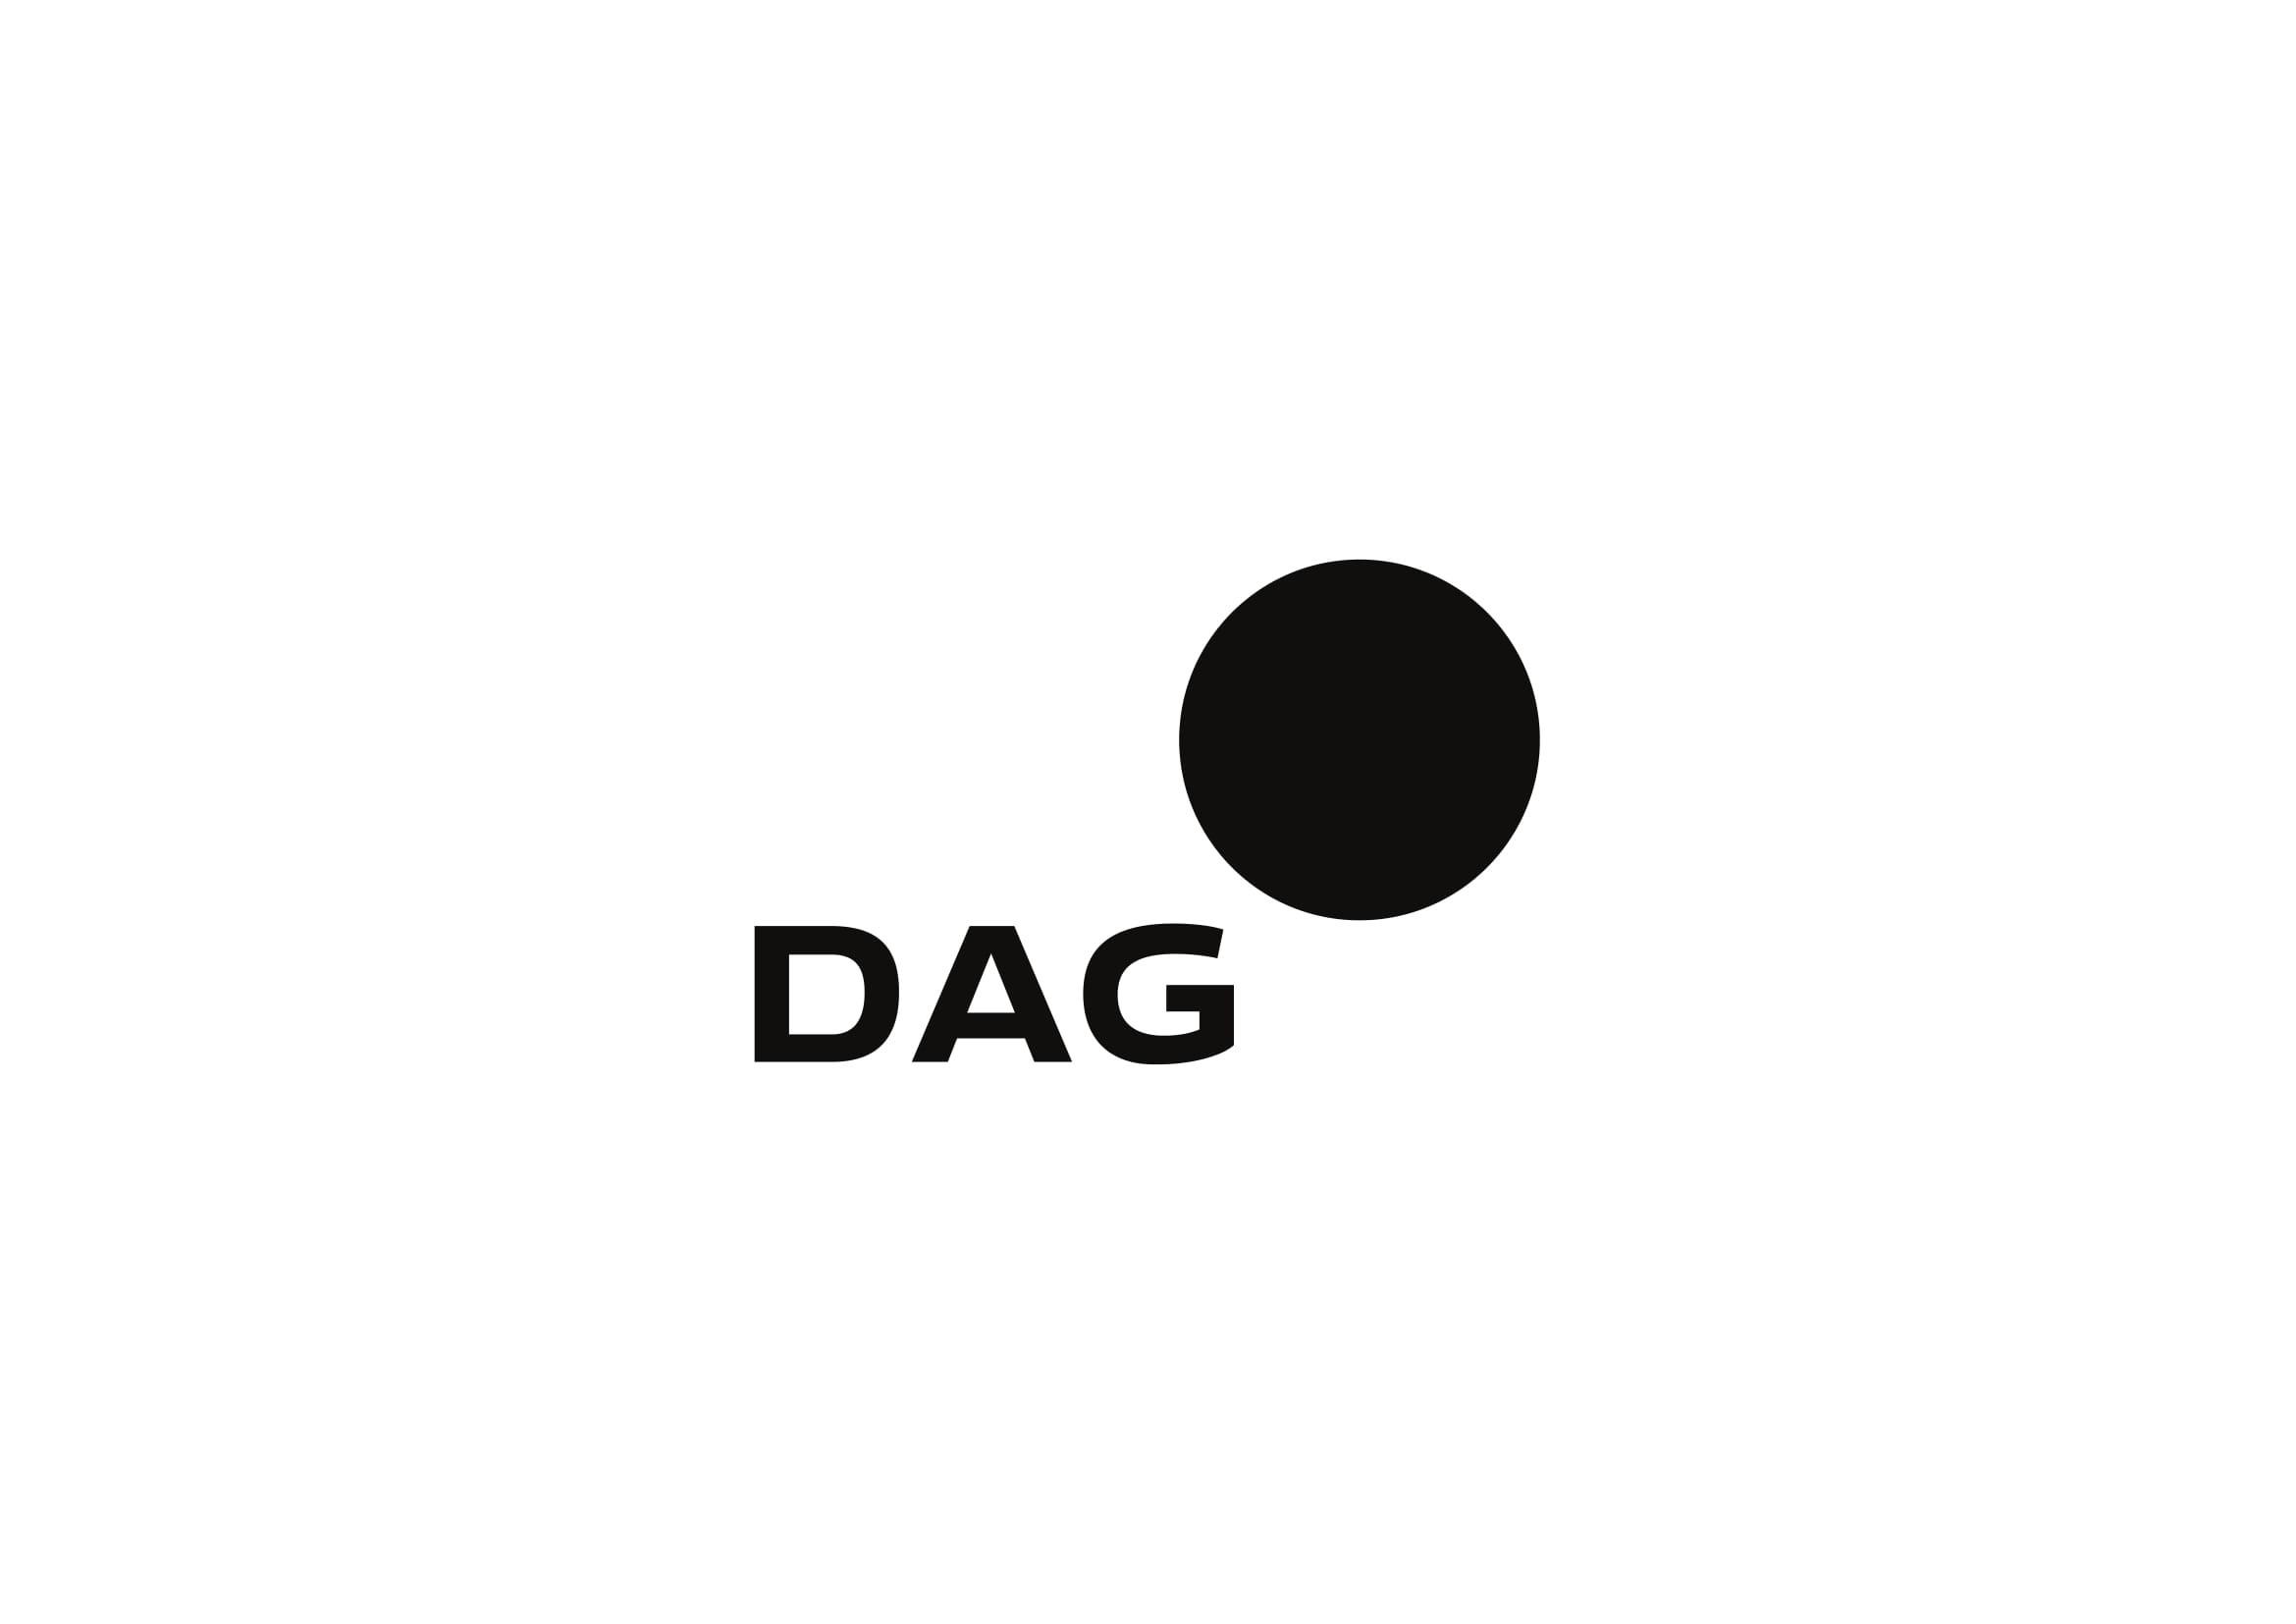 DAG Modern